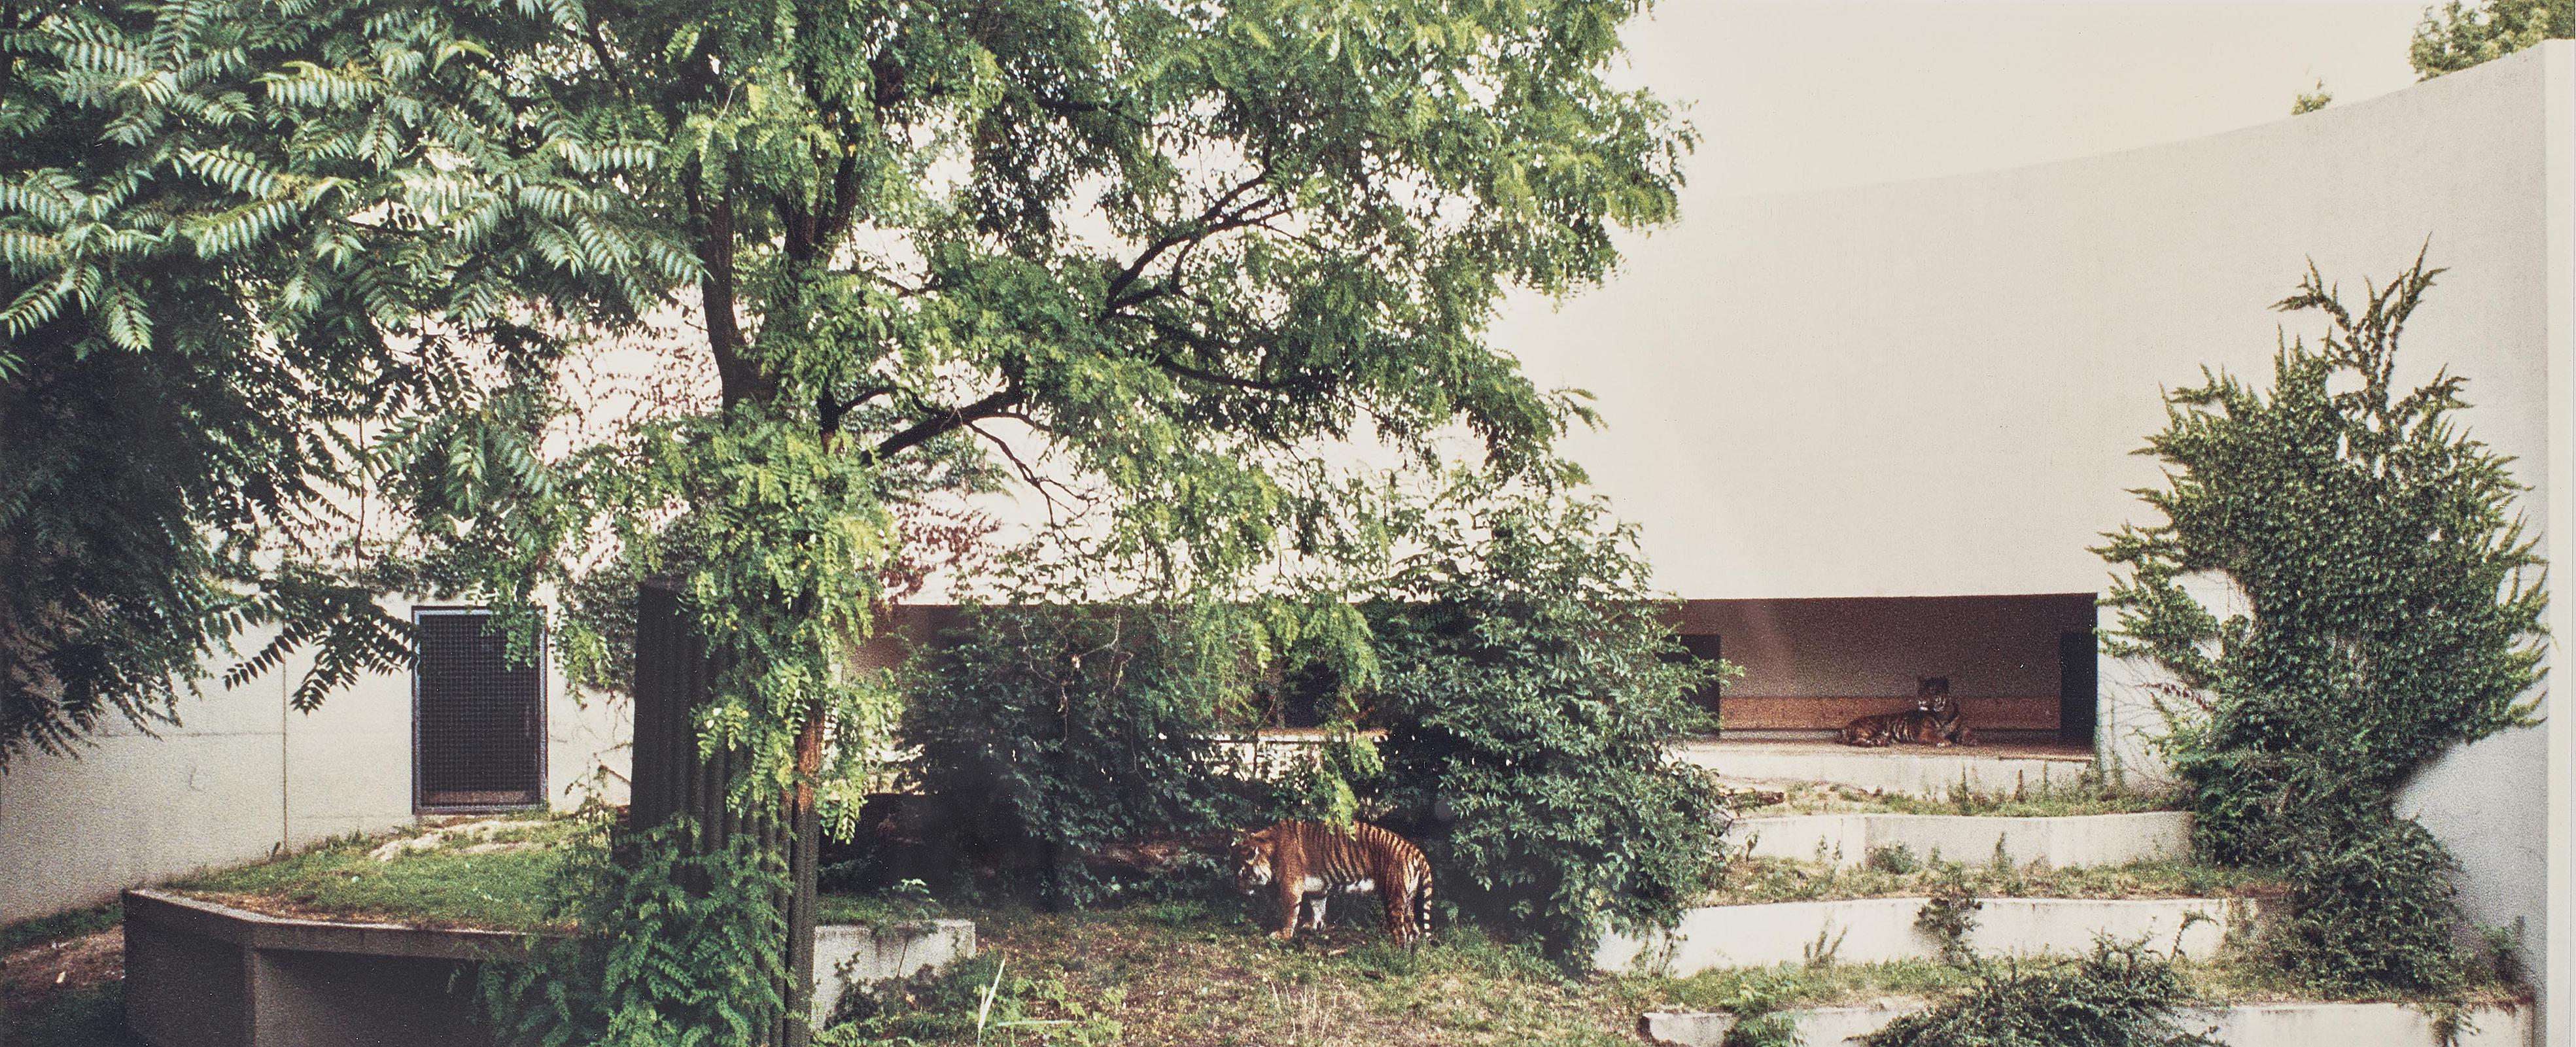 Candida Hofer-Zoologischer Garten Stuttgart I (Zoo Stuttgart I)-1991